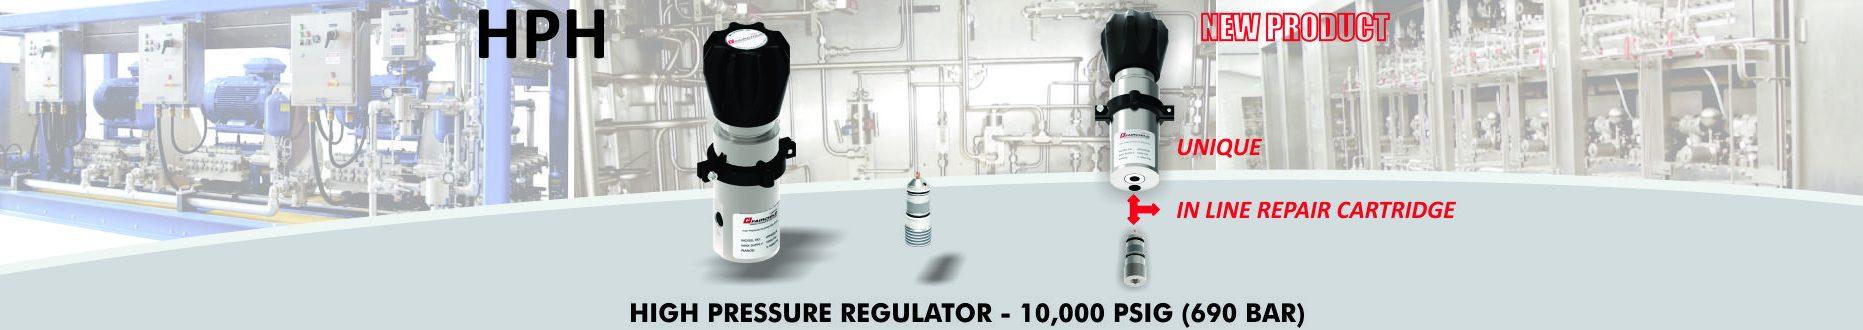 High Pressure Regulator (Hydraulic and Gases) - 10000 PSIG (690 Bar)